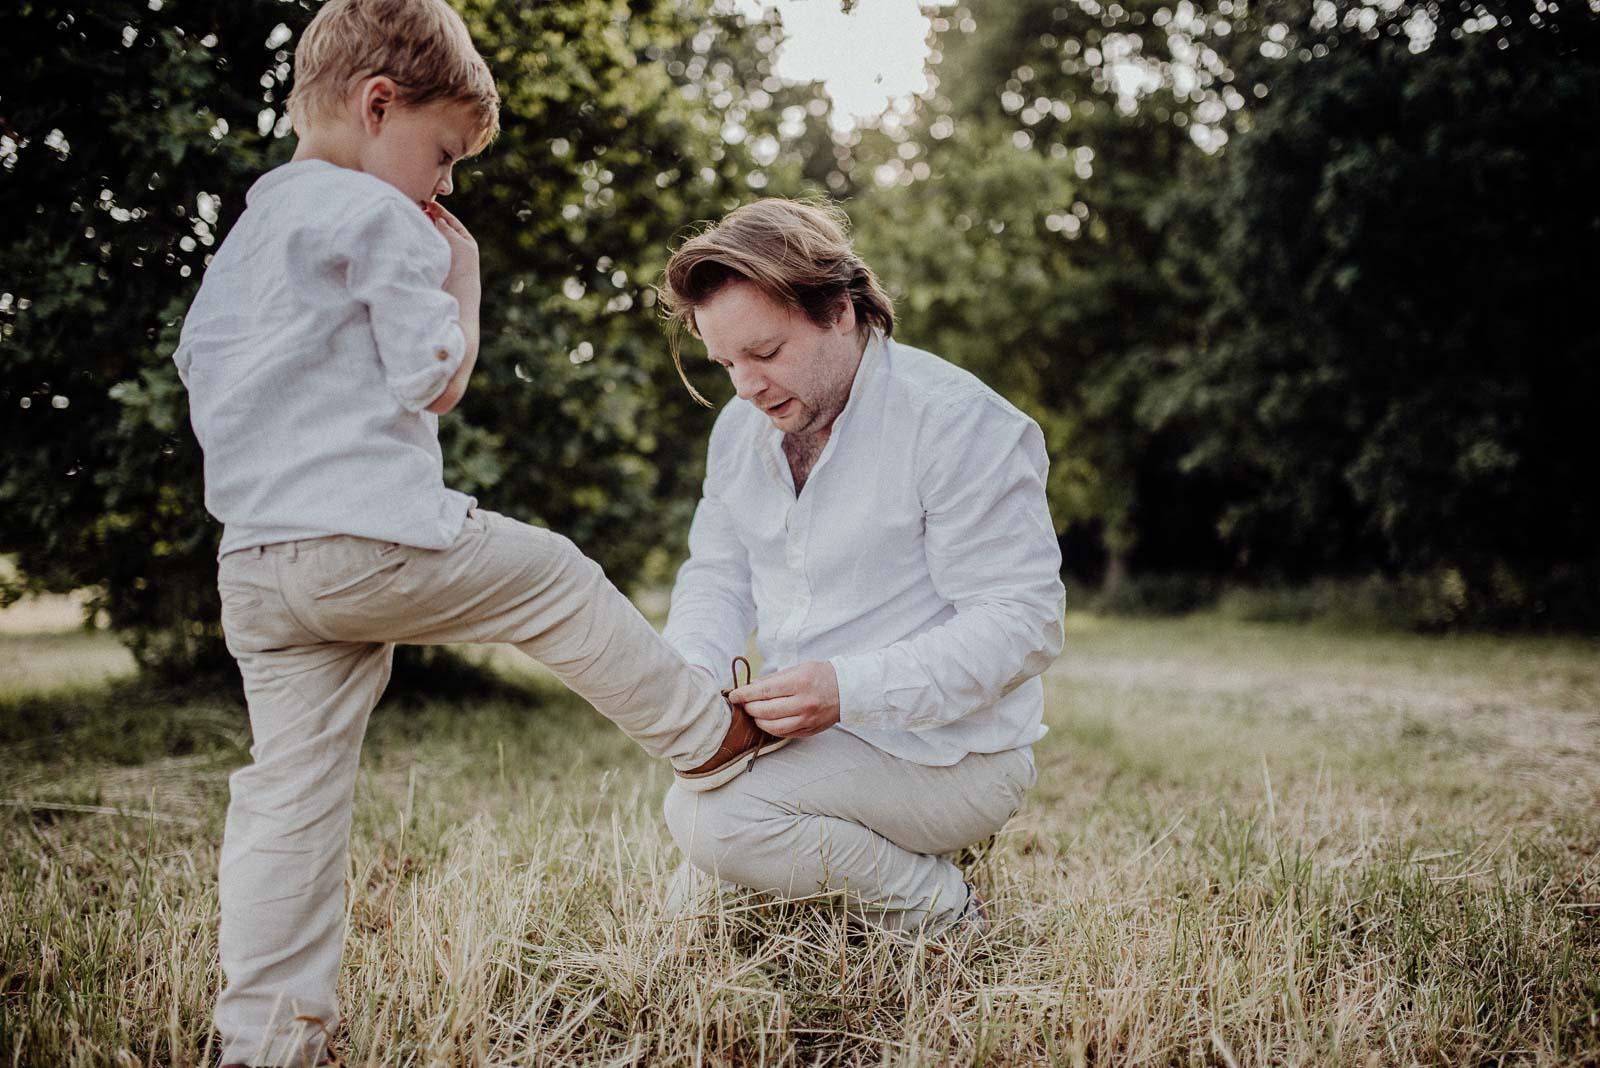 032-familien-fotoshooting-herne-heide